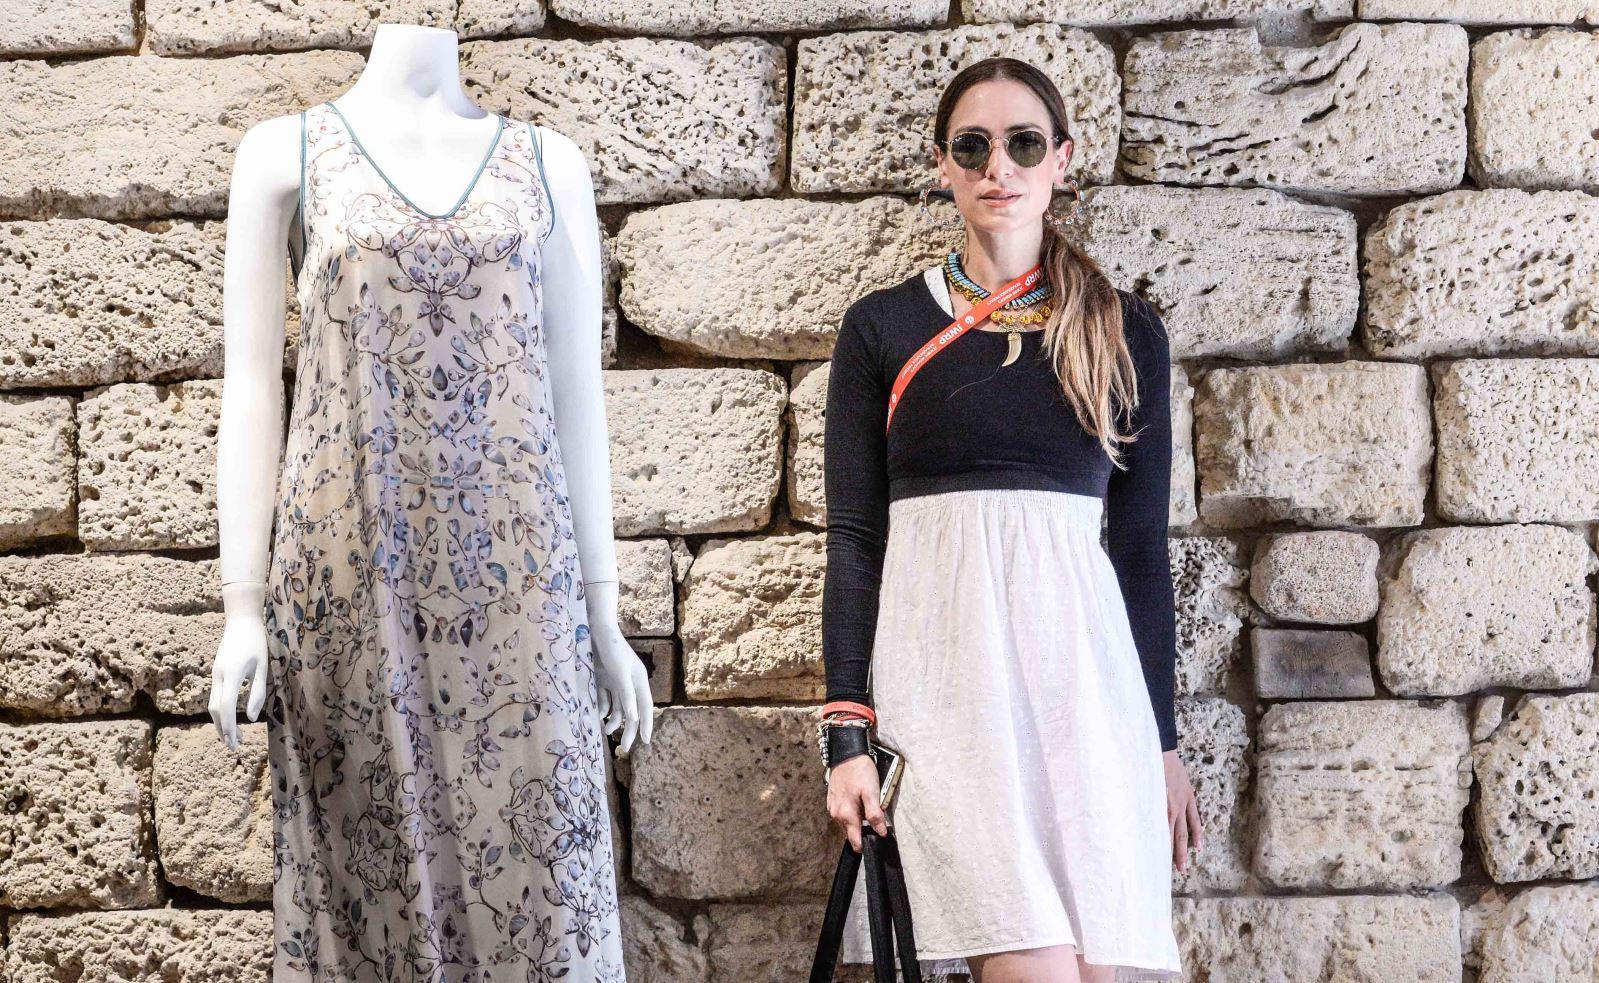 Rebekah Price of Toronto at the Maskit Israeli luxury label showroom in Old Jaffa. Photo by Aviram Valdman